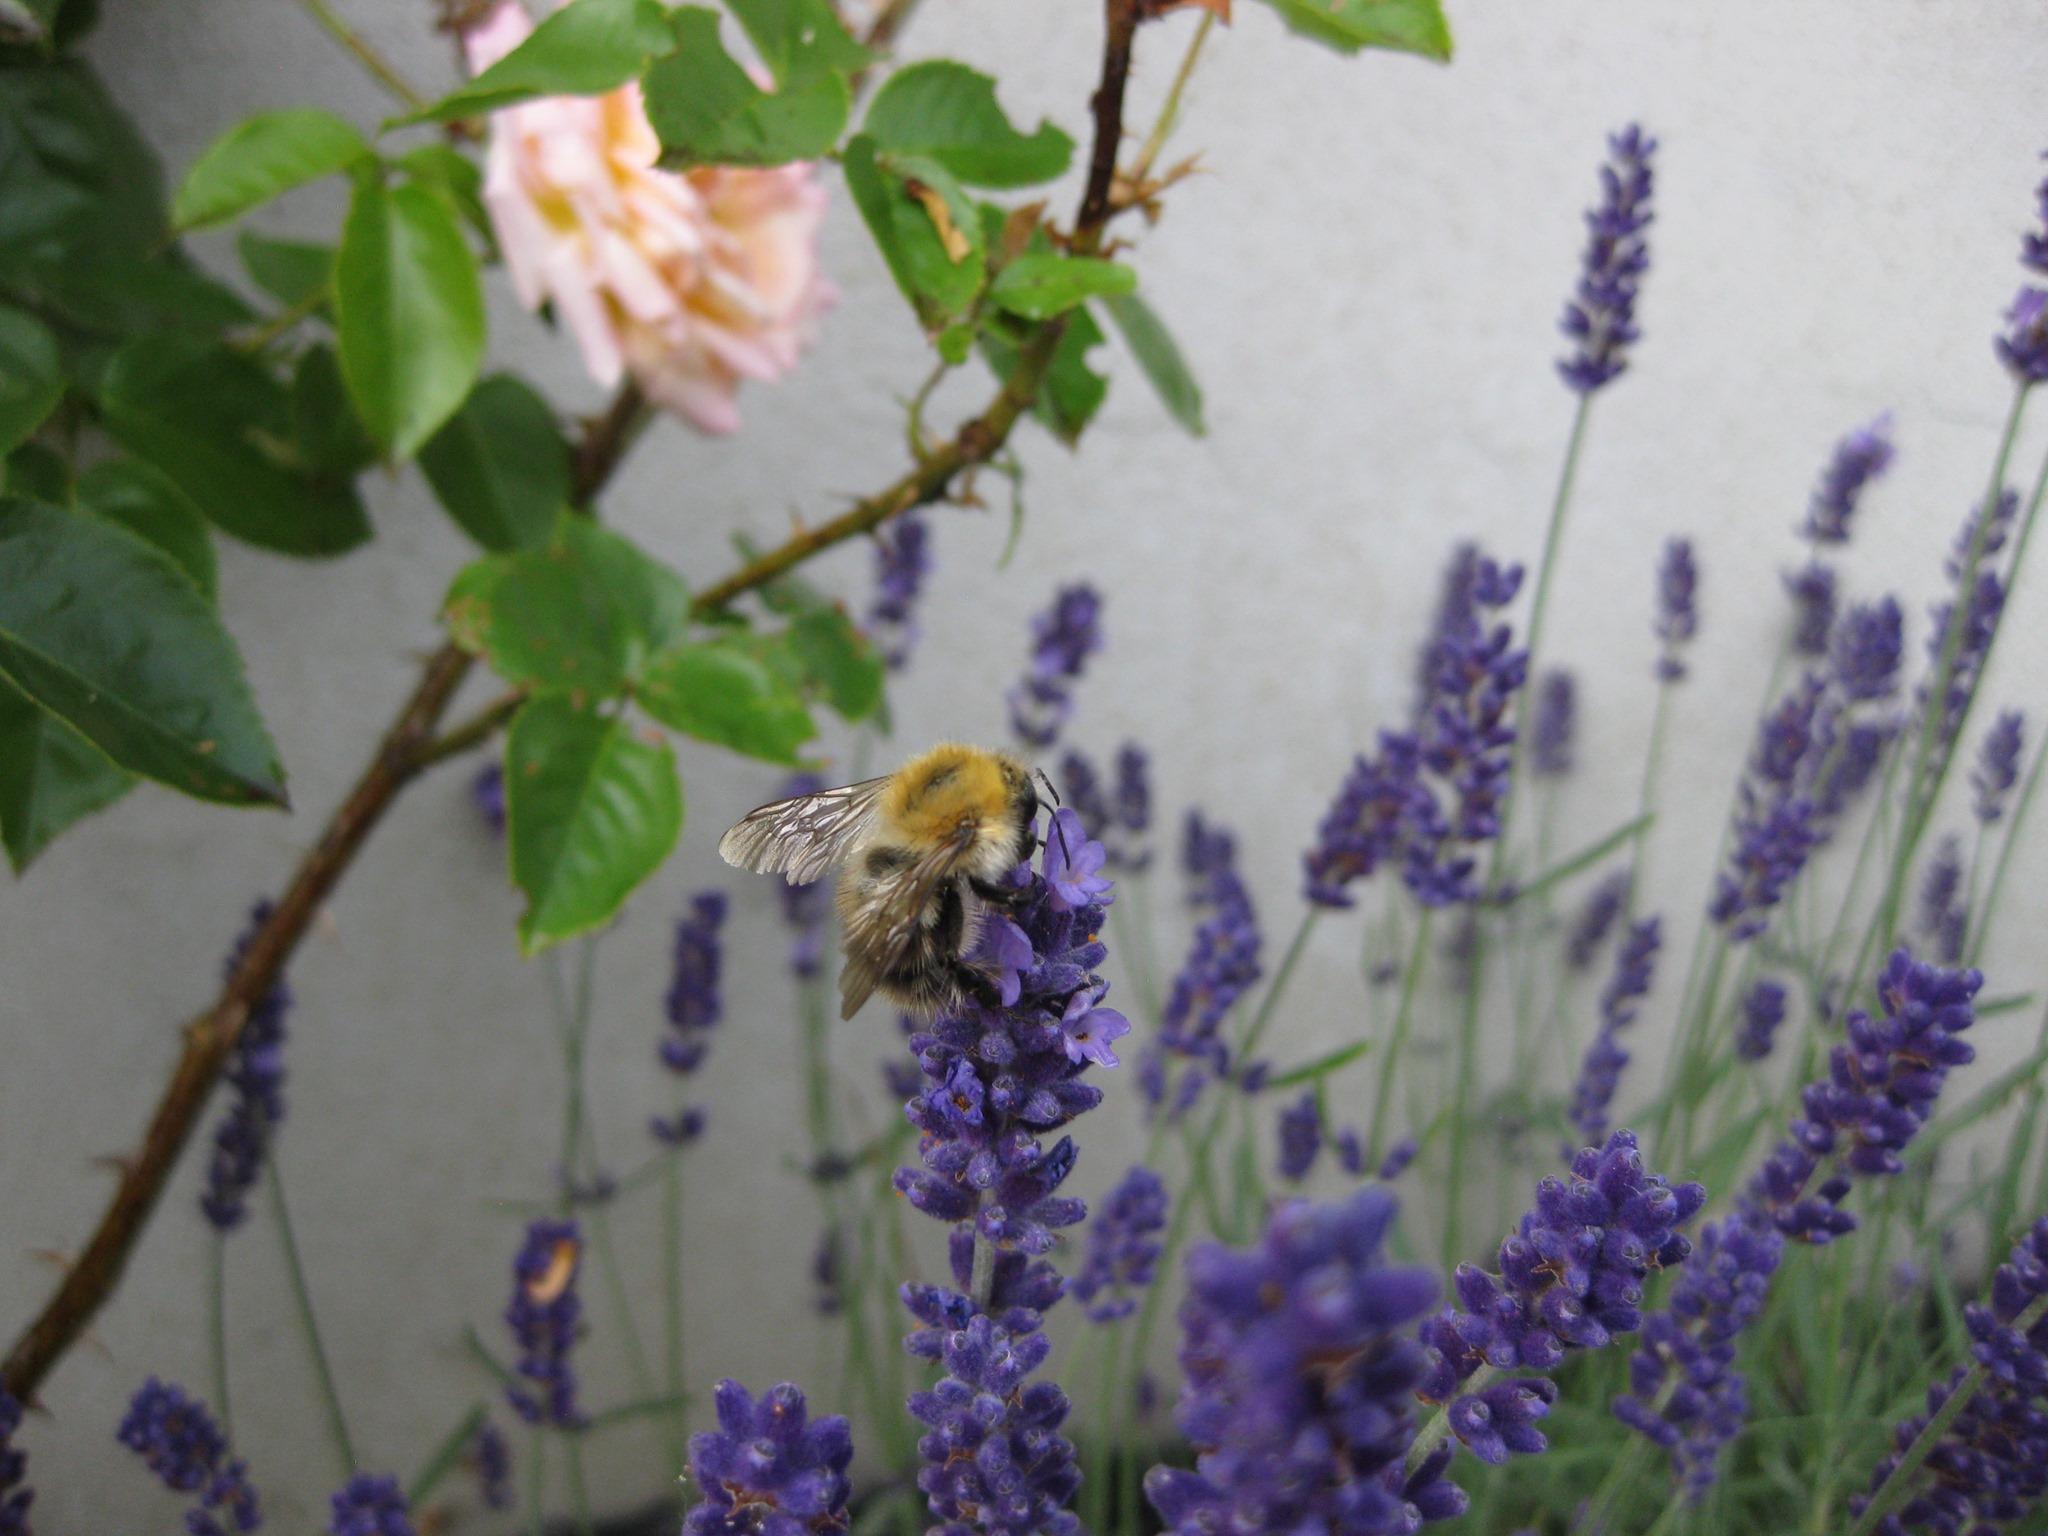 Spritzschutzstreifen - Acker-Hummel auf Echtem Lavendel